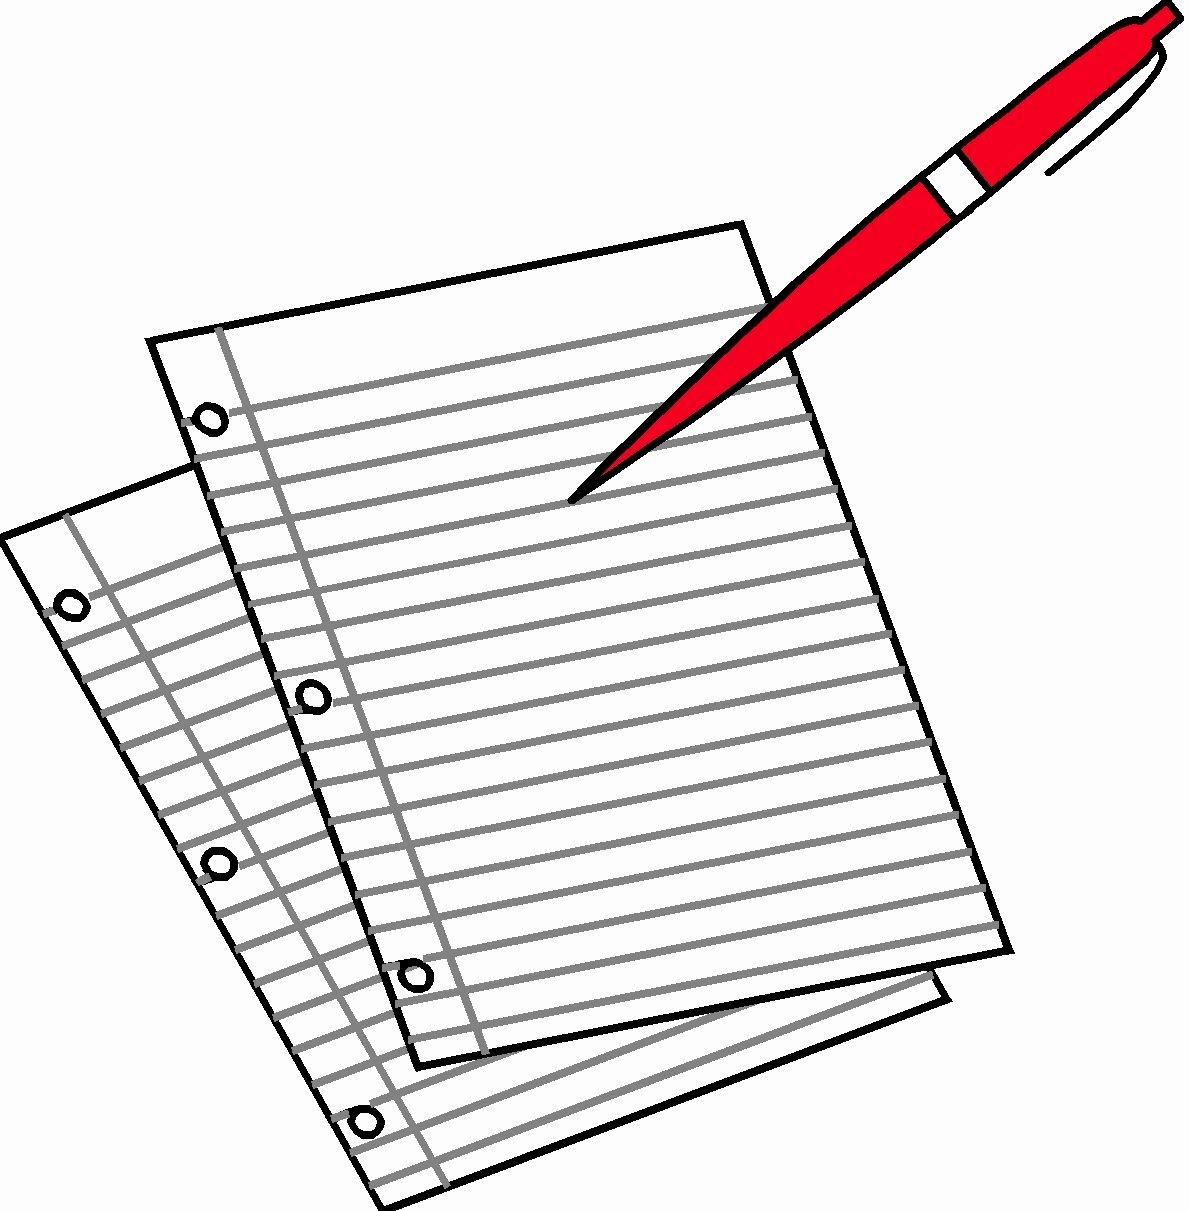 Essay Writing Clip Art Best Of Essay Writing Clipart – 101 Clip Art